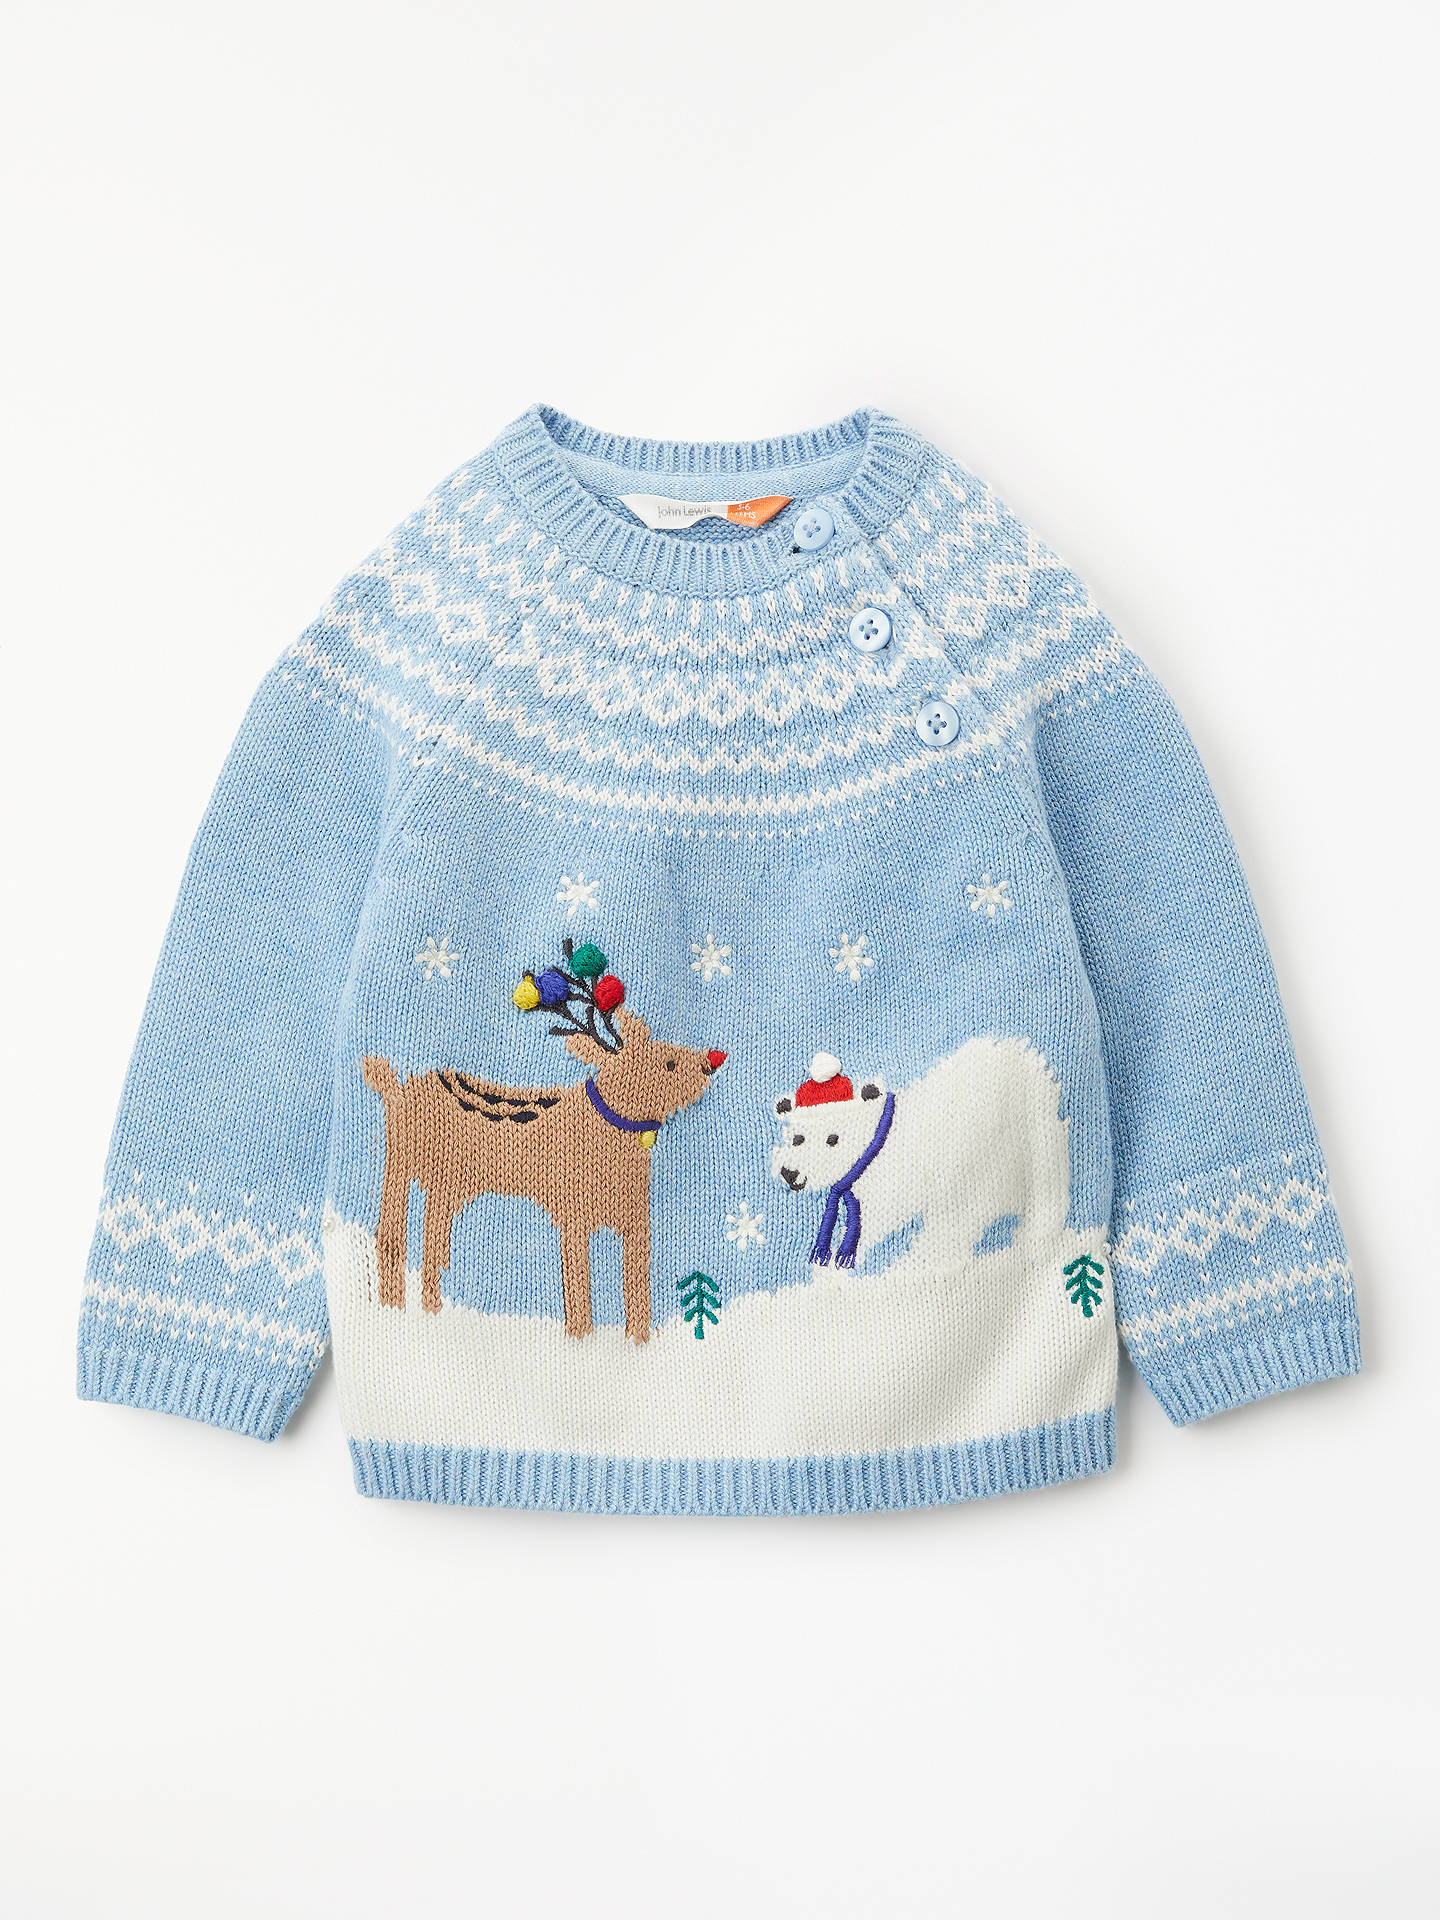 BuyJohn Lewis Baby Reindeer and Polar Bear Christmas Jumper a3d7e82f6